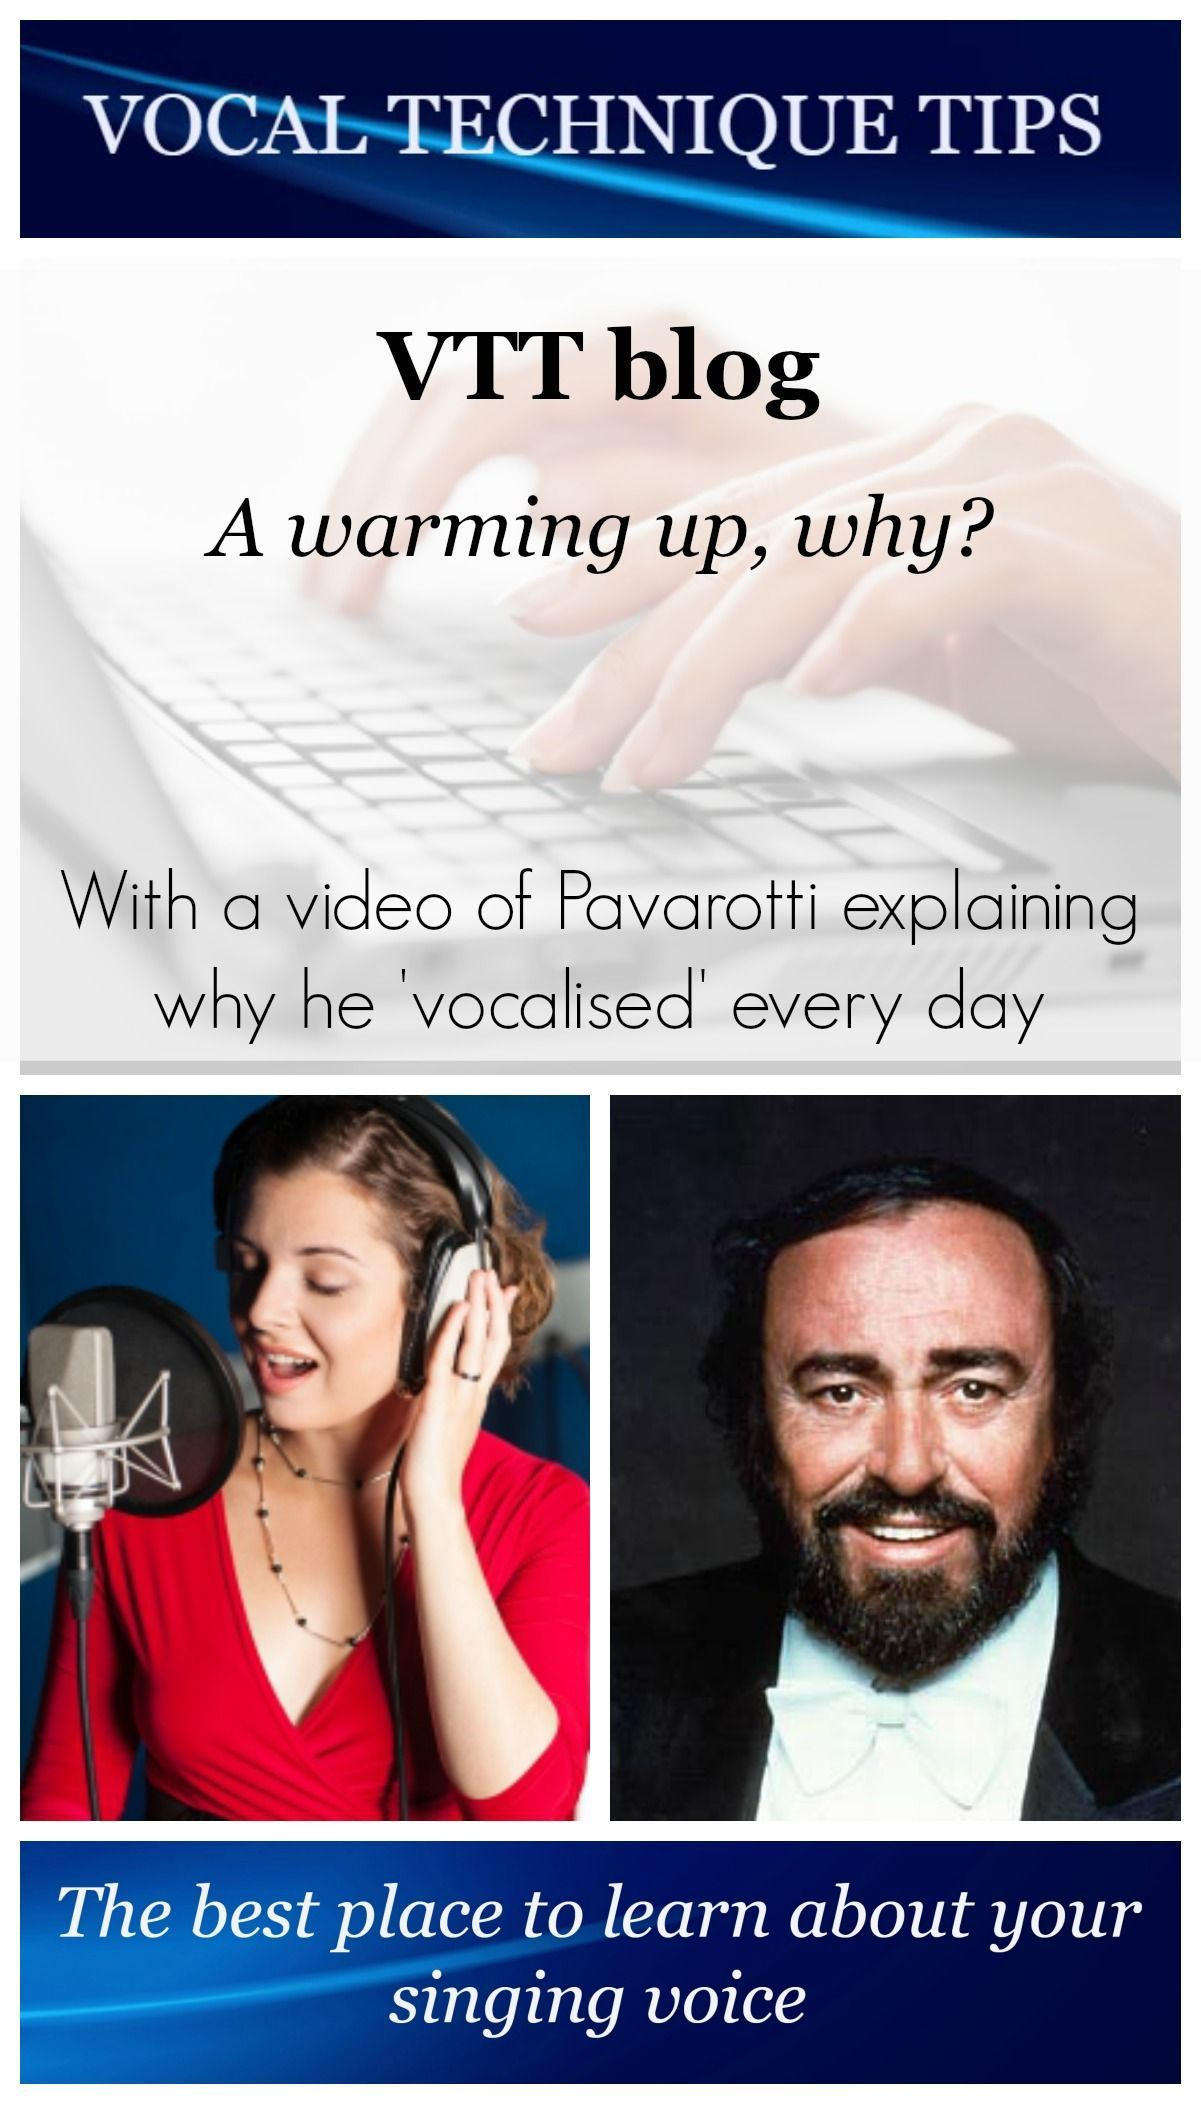 PinVTTBlogA warming up why Singing lessons, Singing